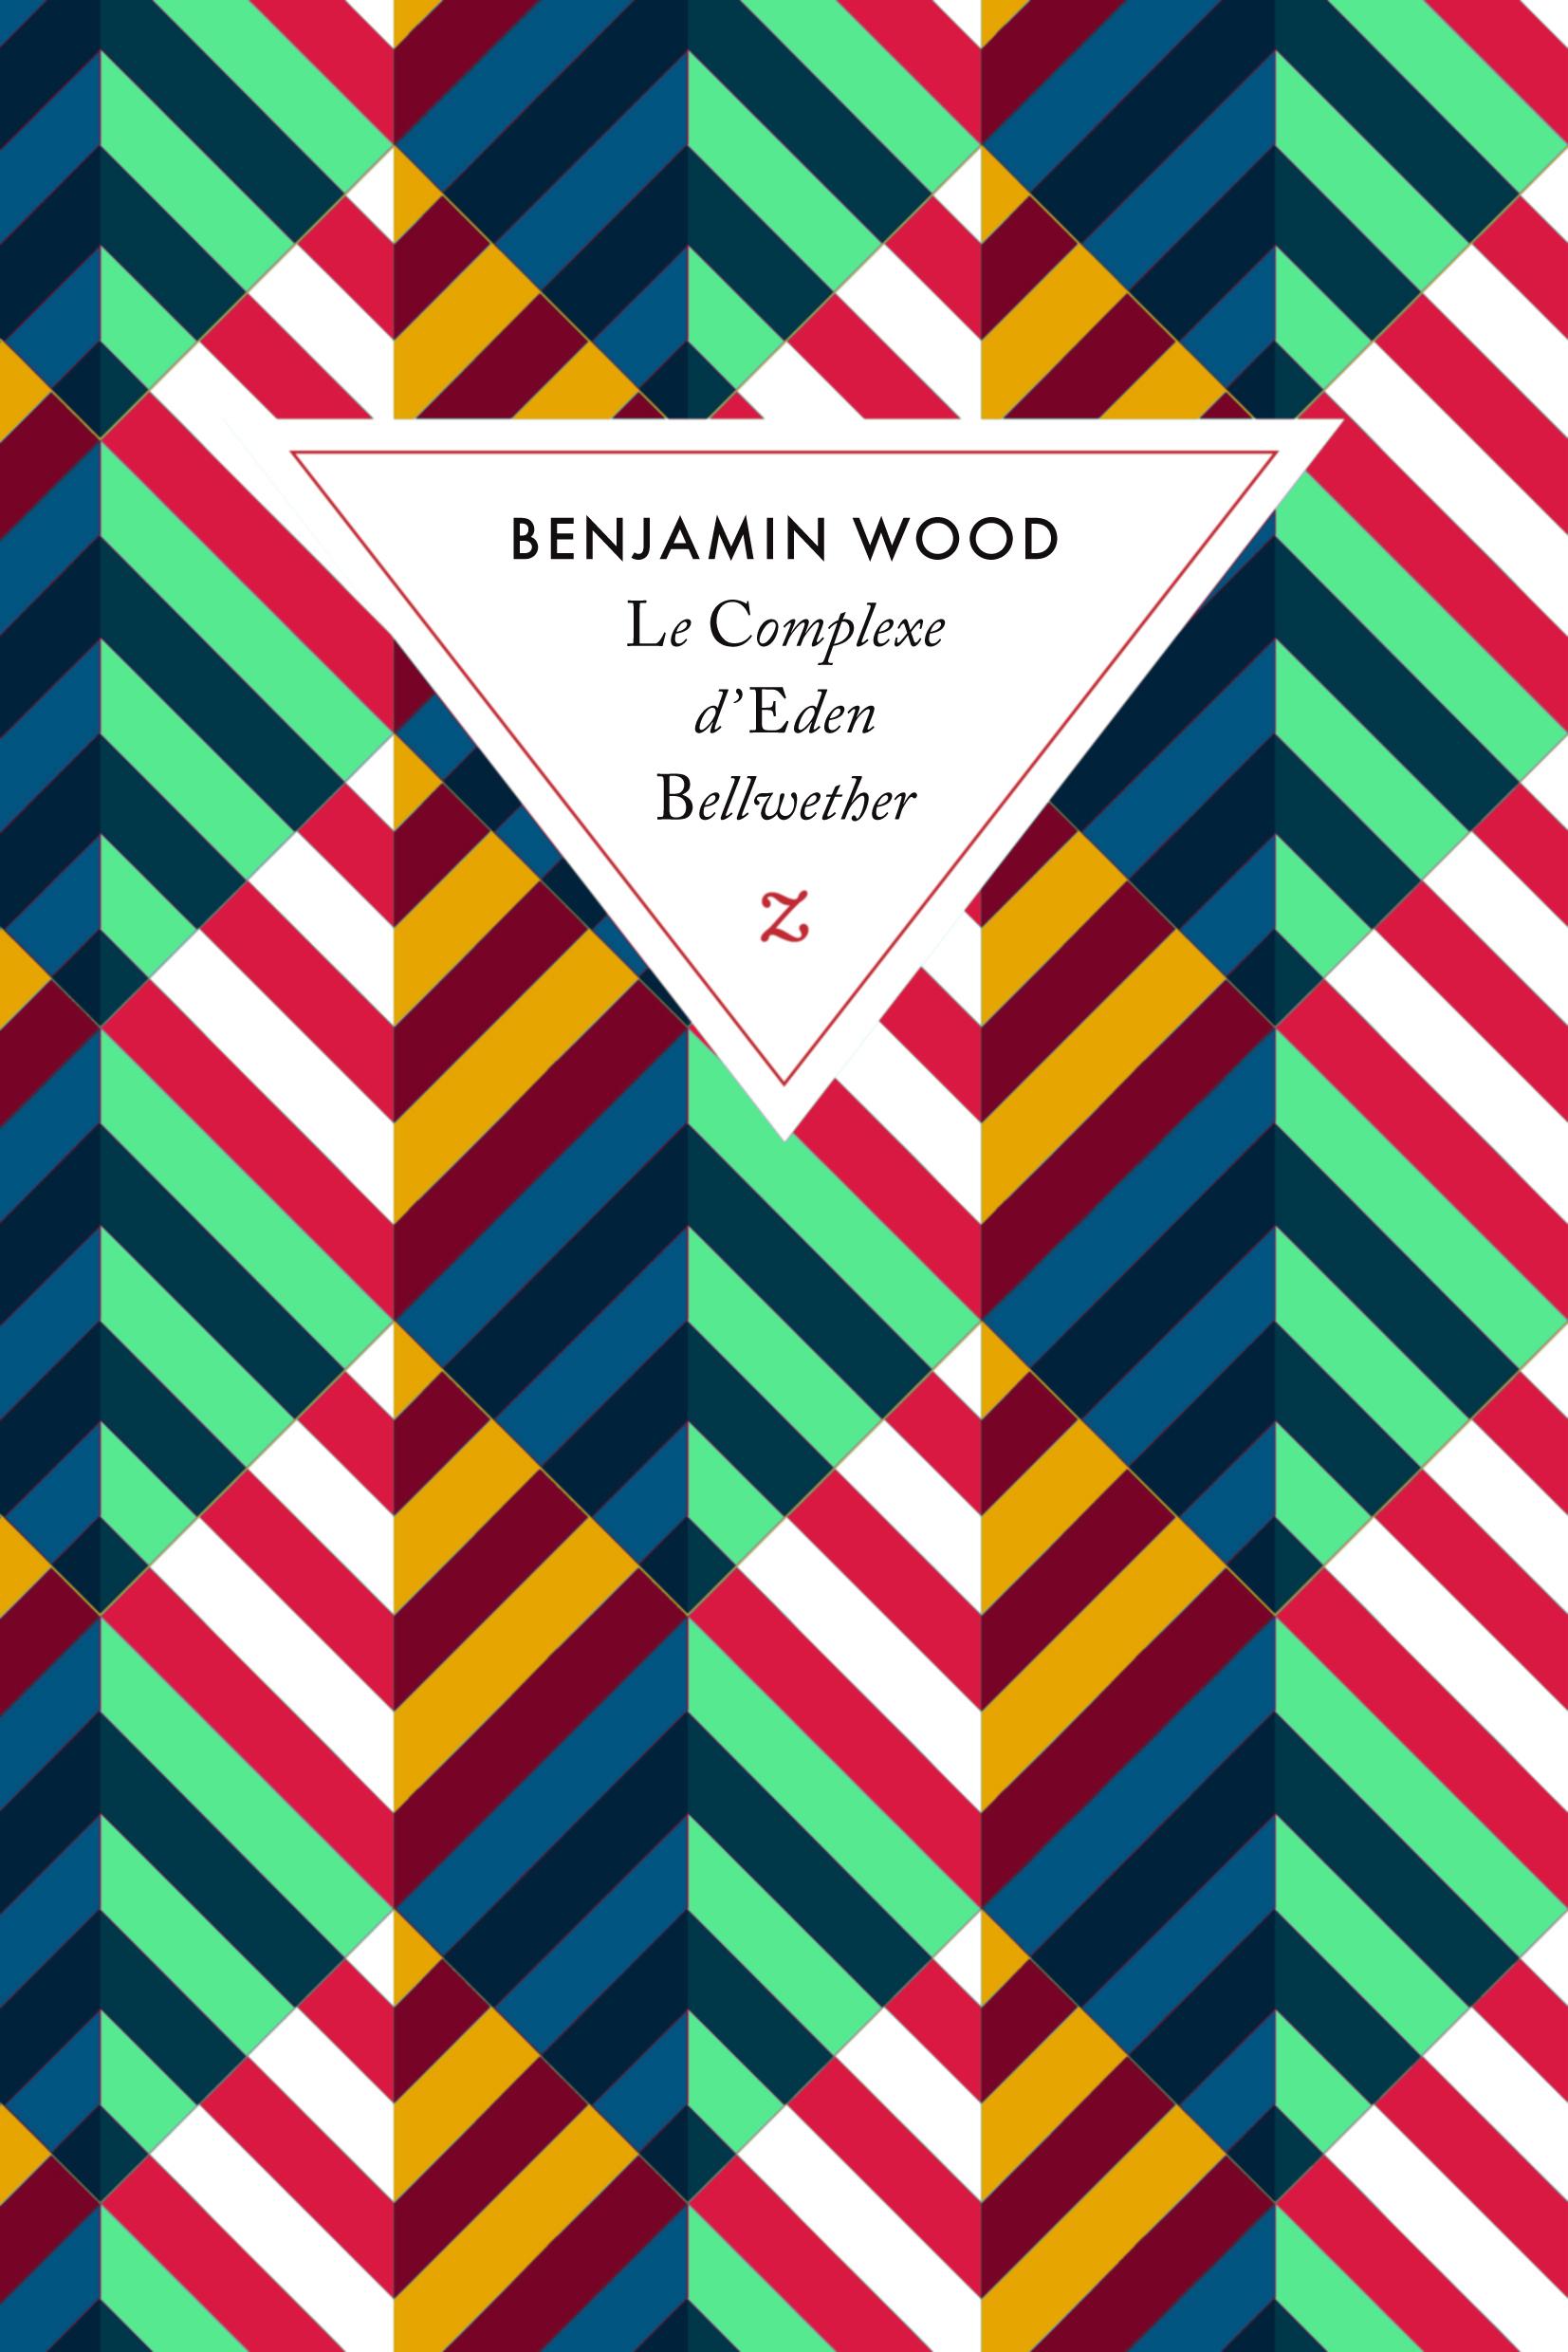 le-complexe-d'eden-bellwether-benjamin-wood-editions-zulma